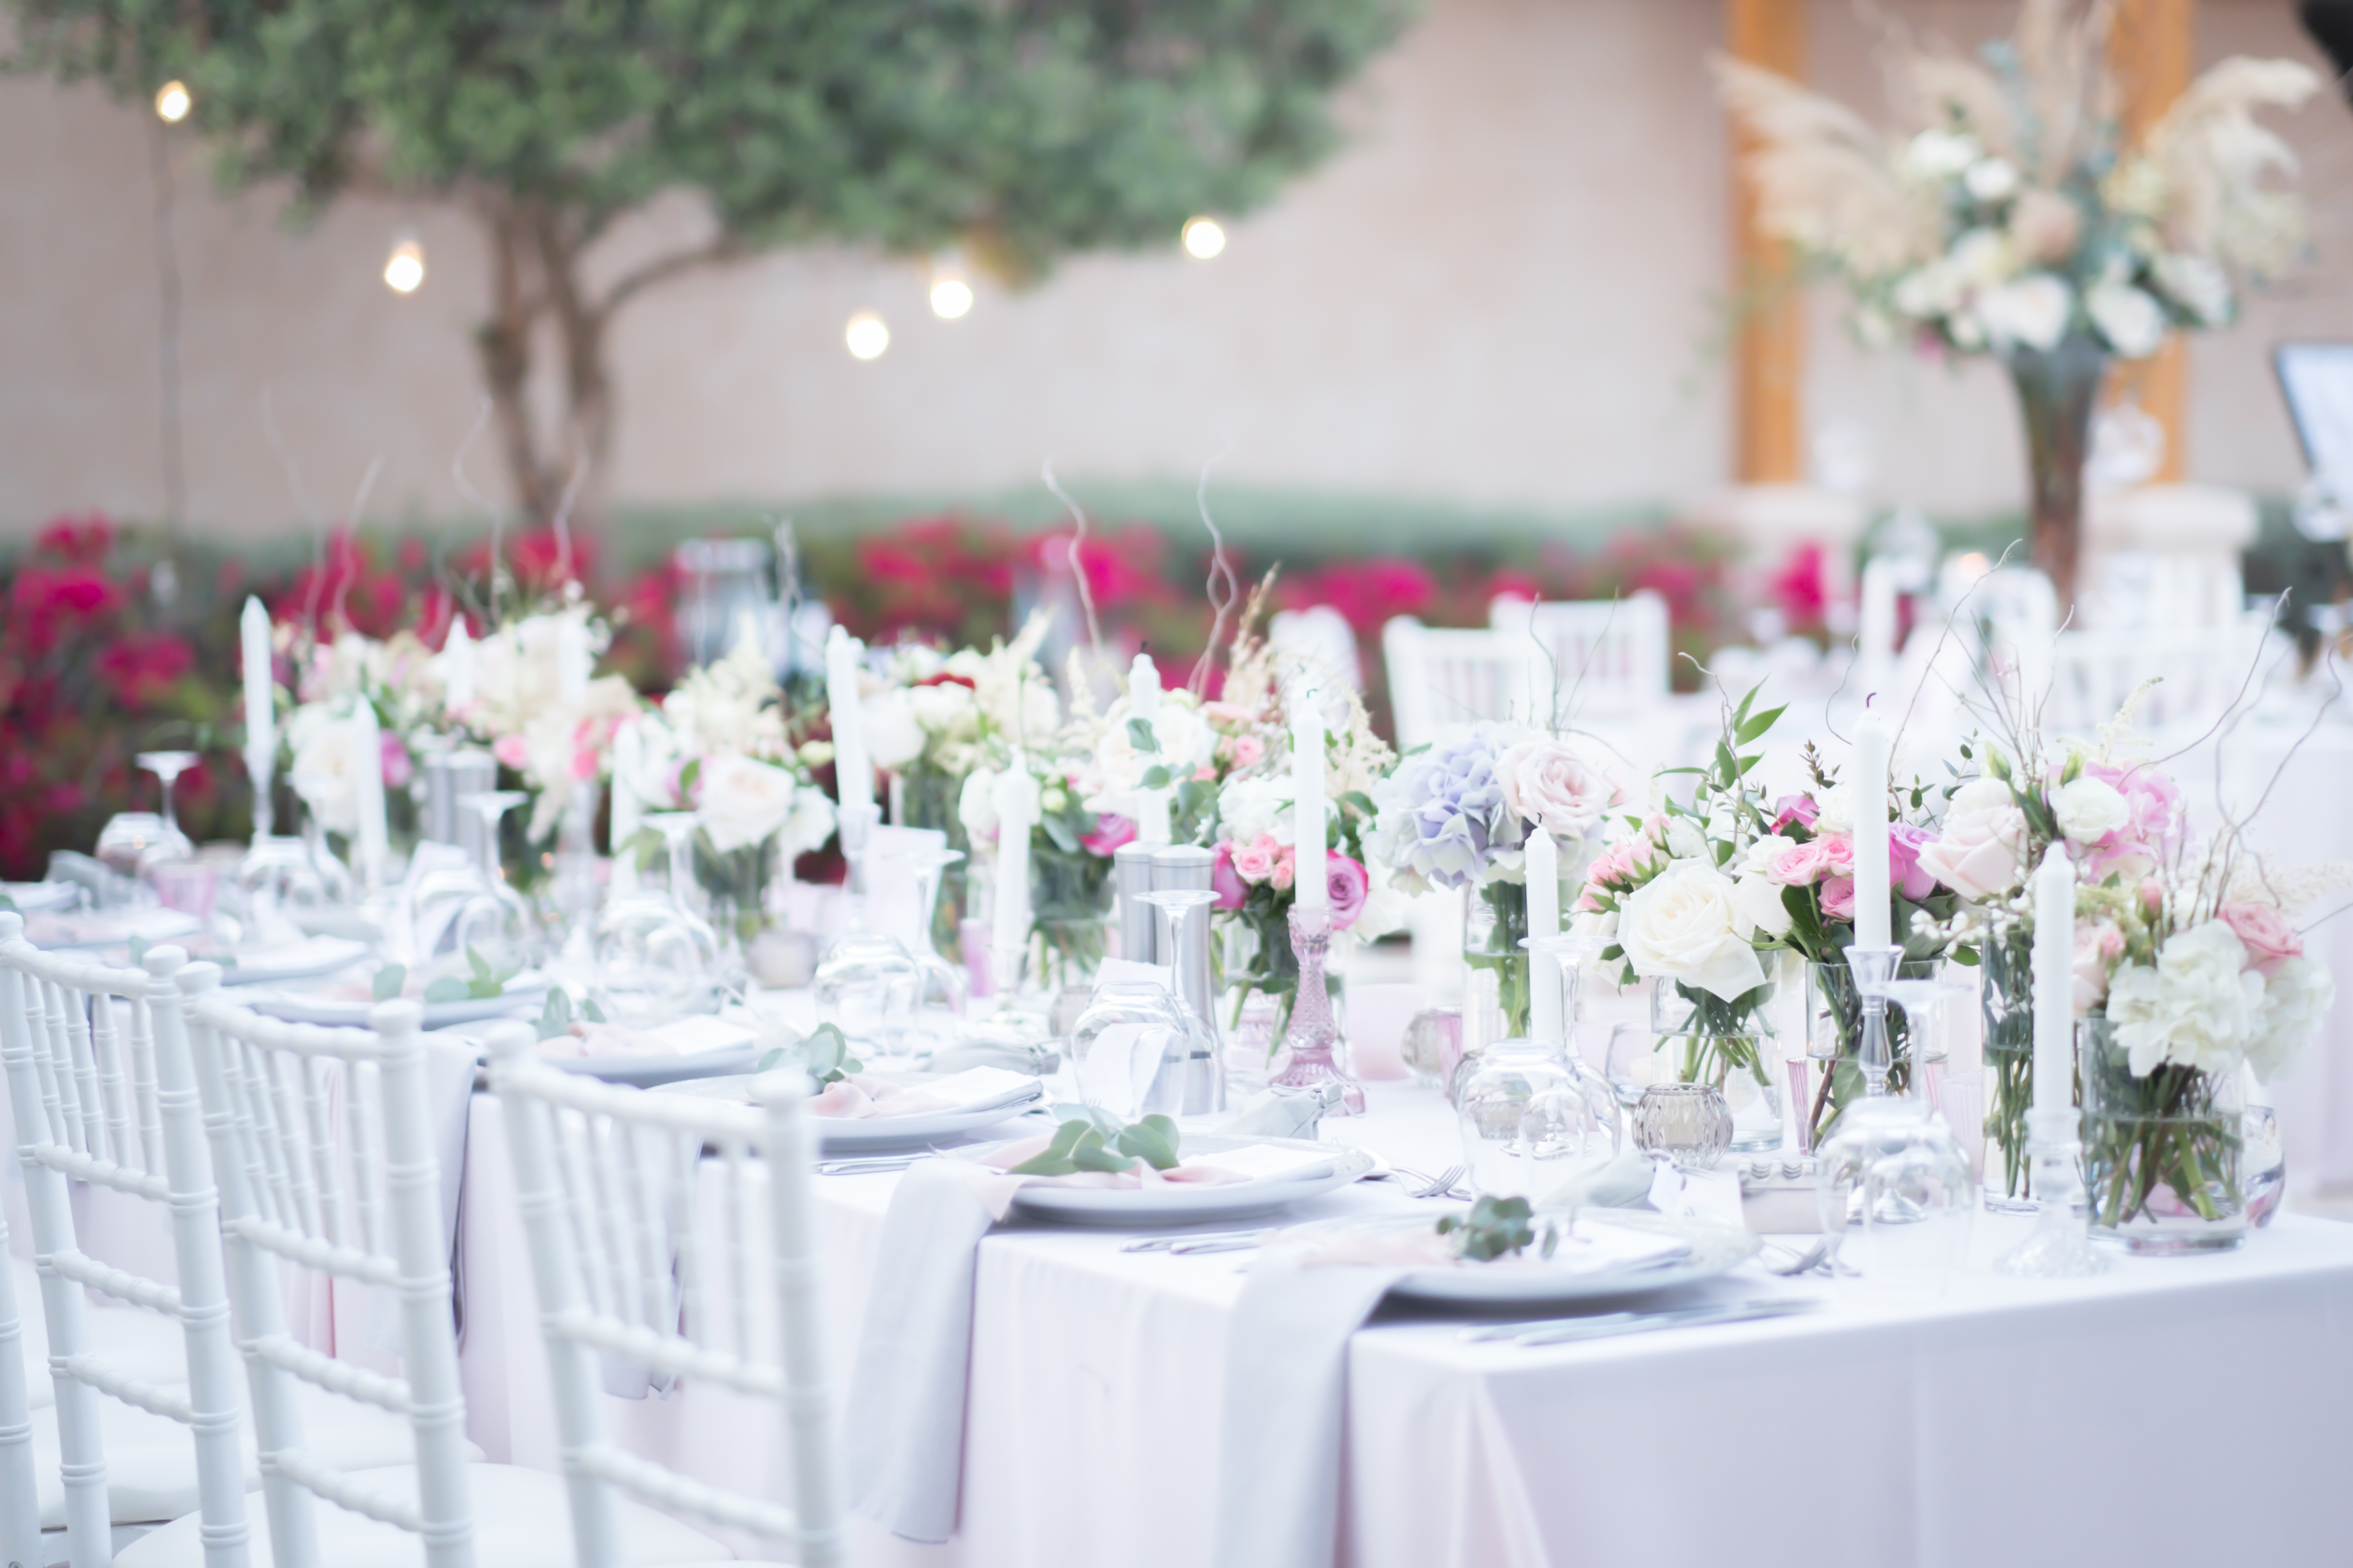 Dubai wedding planner + Stylist - My Lovely Wedding - One and Only Palm Dubai